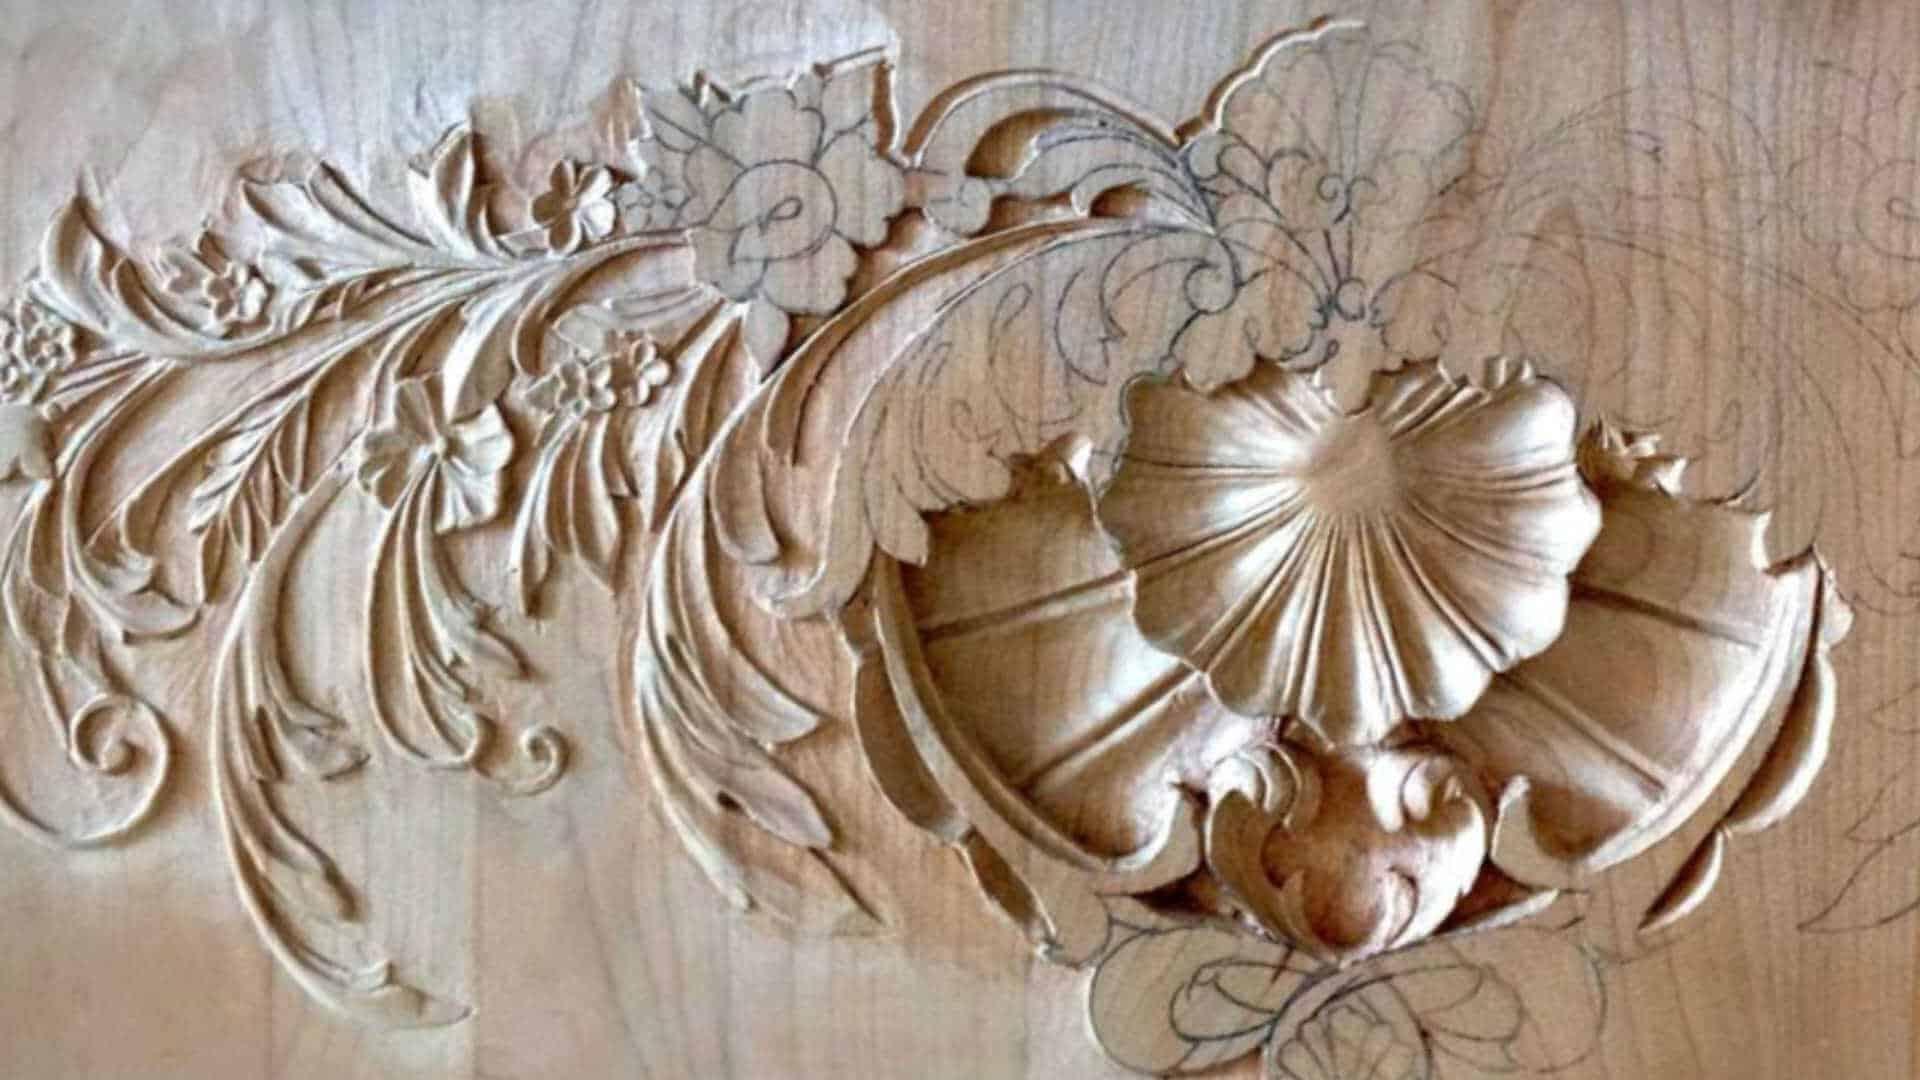 Learn Wood Carving with Alexander Grabovetskiy